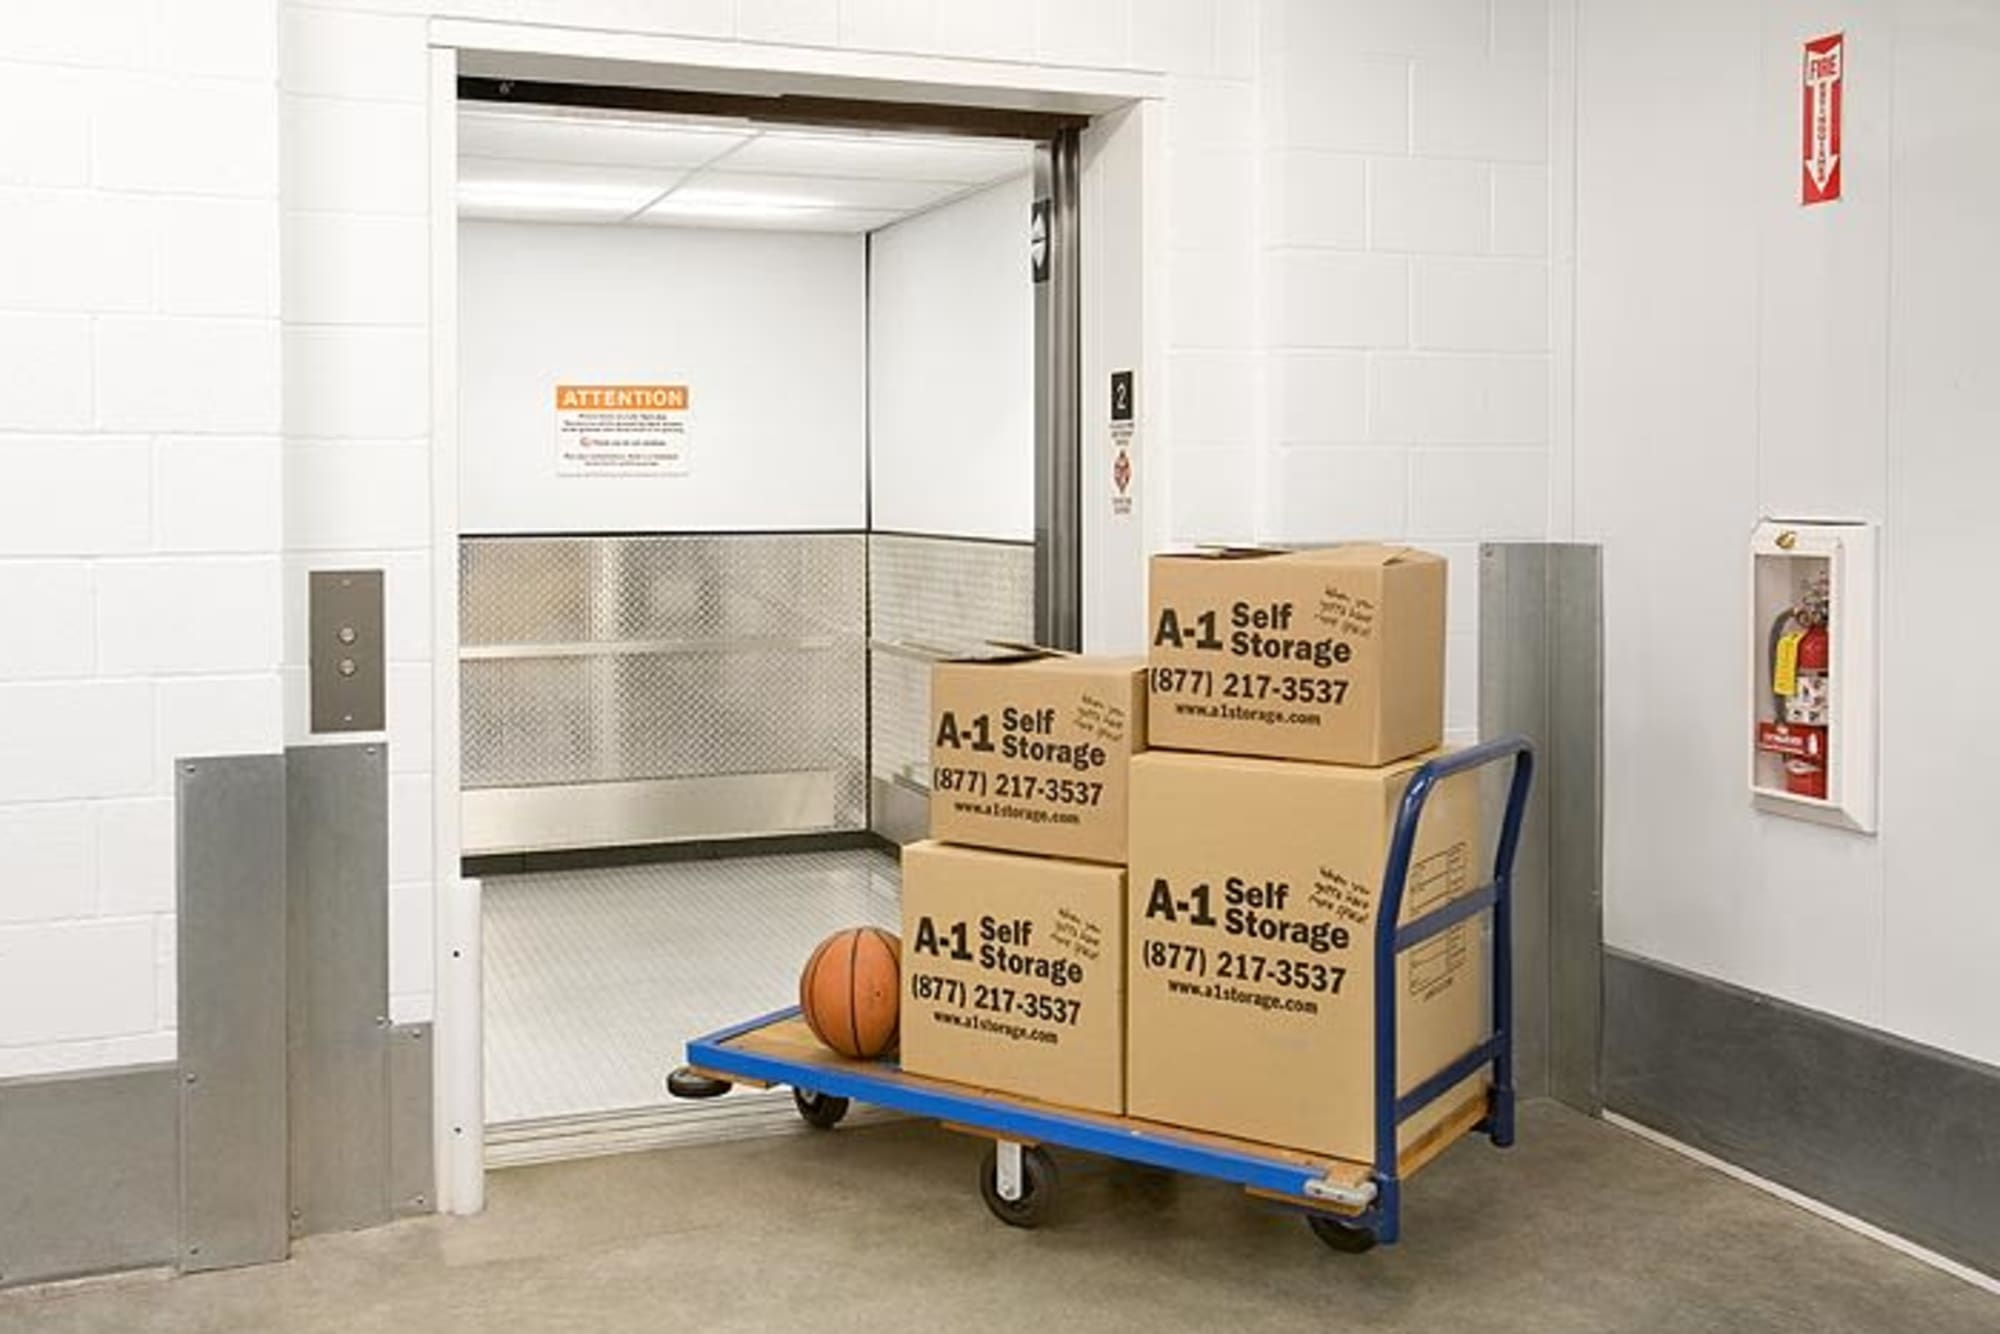 Boxes at A-1 Self Storage